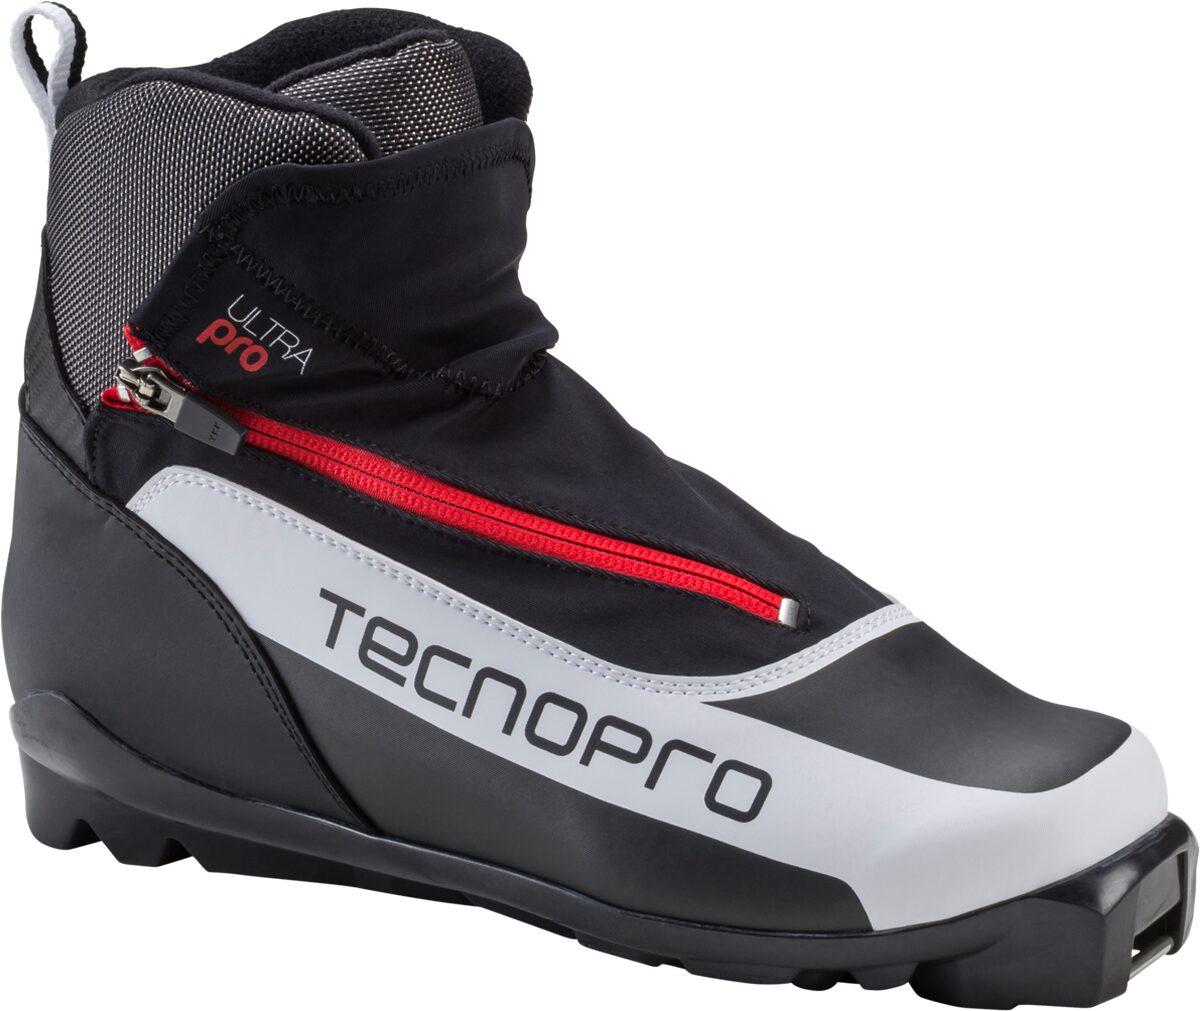 TECNOPRO LL-Schuh Ultra Pro 900 WEISS/SCHWARZ/ROT 10,5